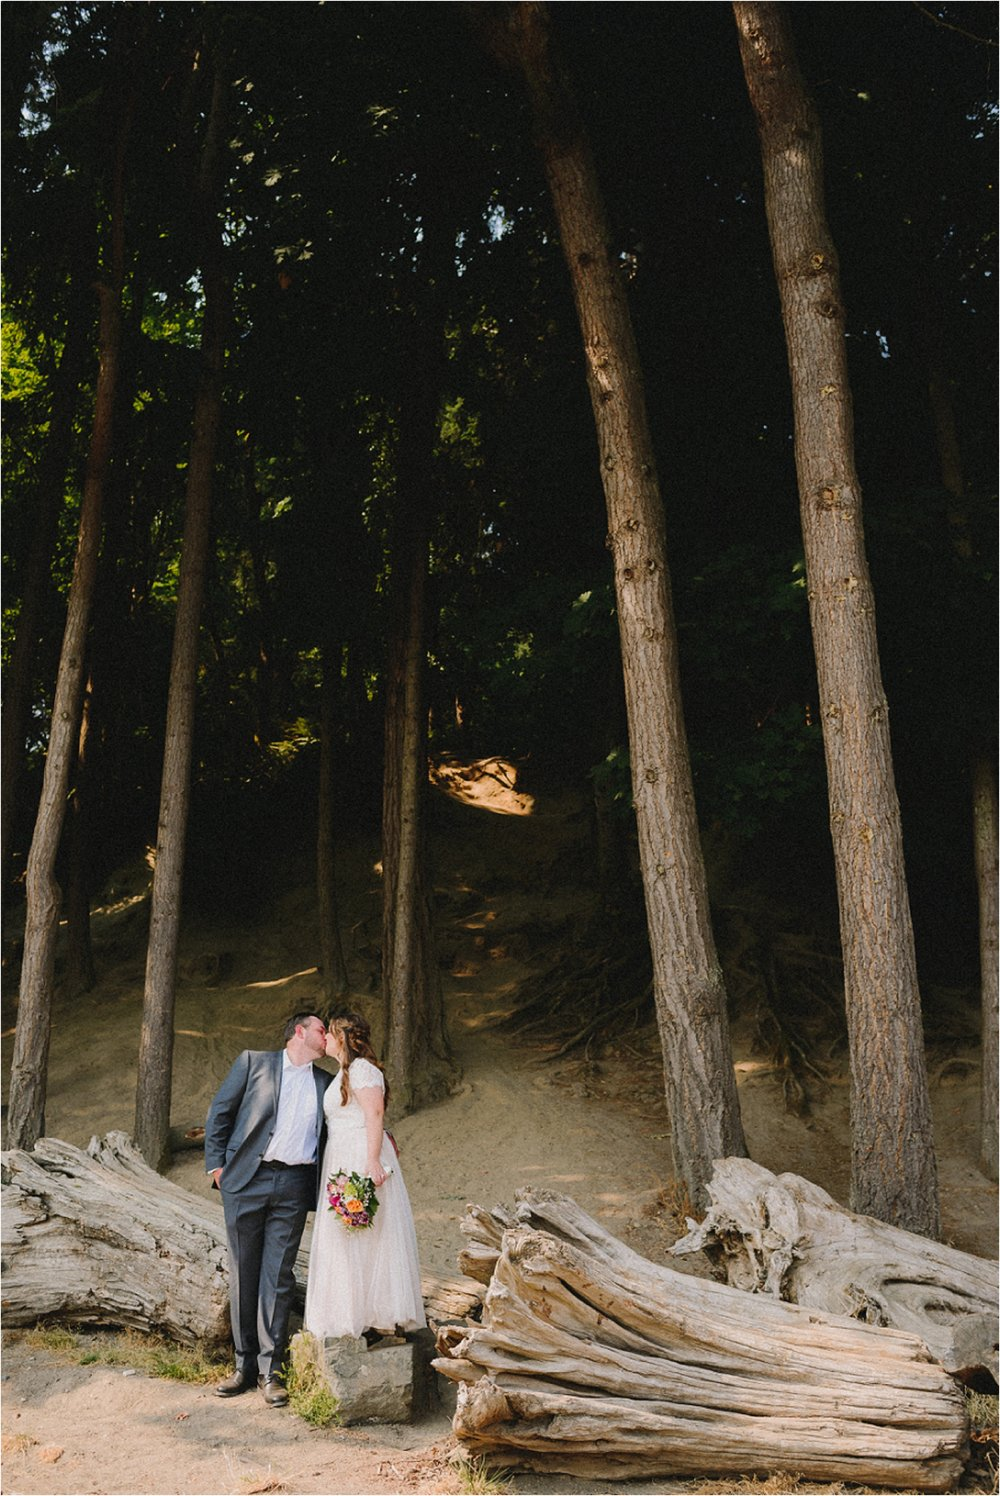 owen-beach-priest-point-park-tacoma-washington-elopement-jannicka-mayte-anchorage-alaska-wedding-elopement-photographer (55).jpg